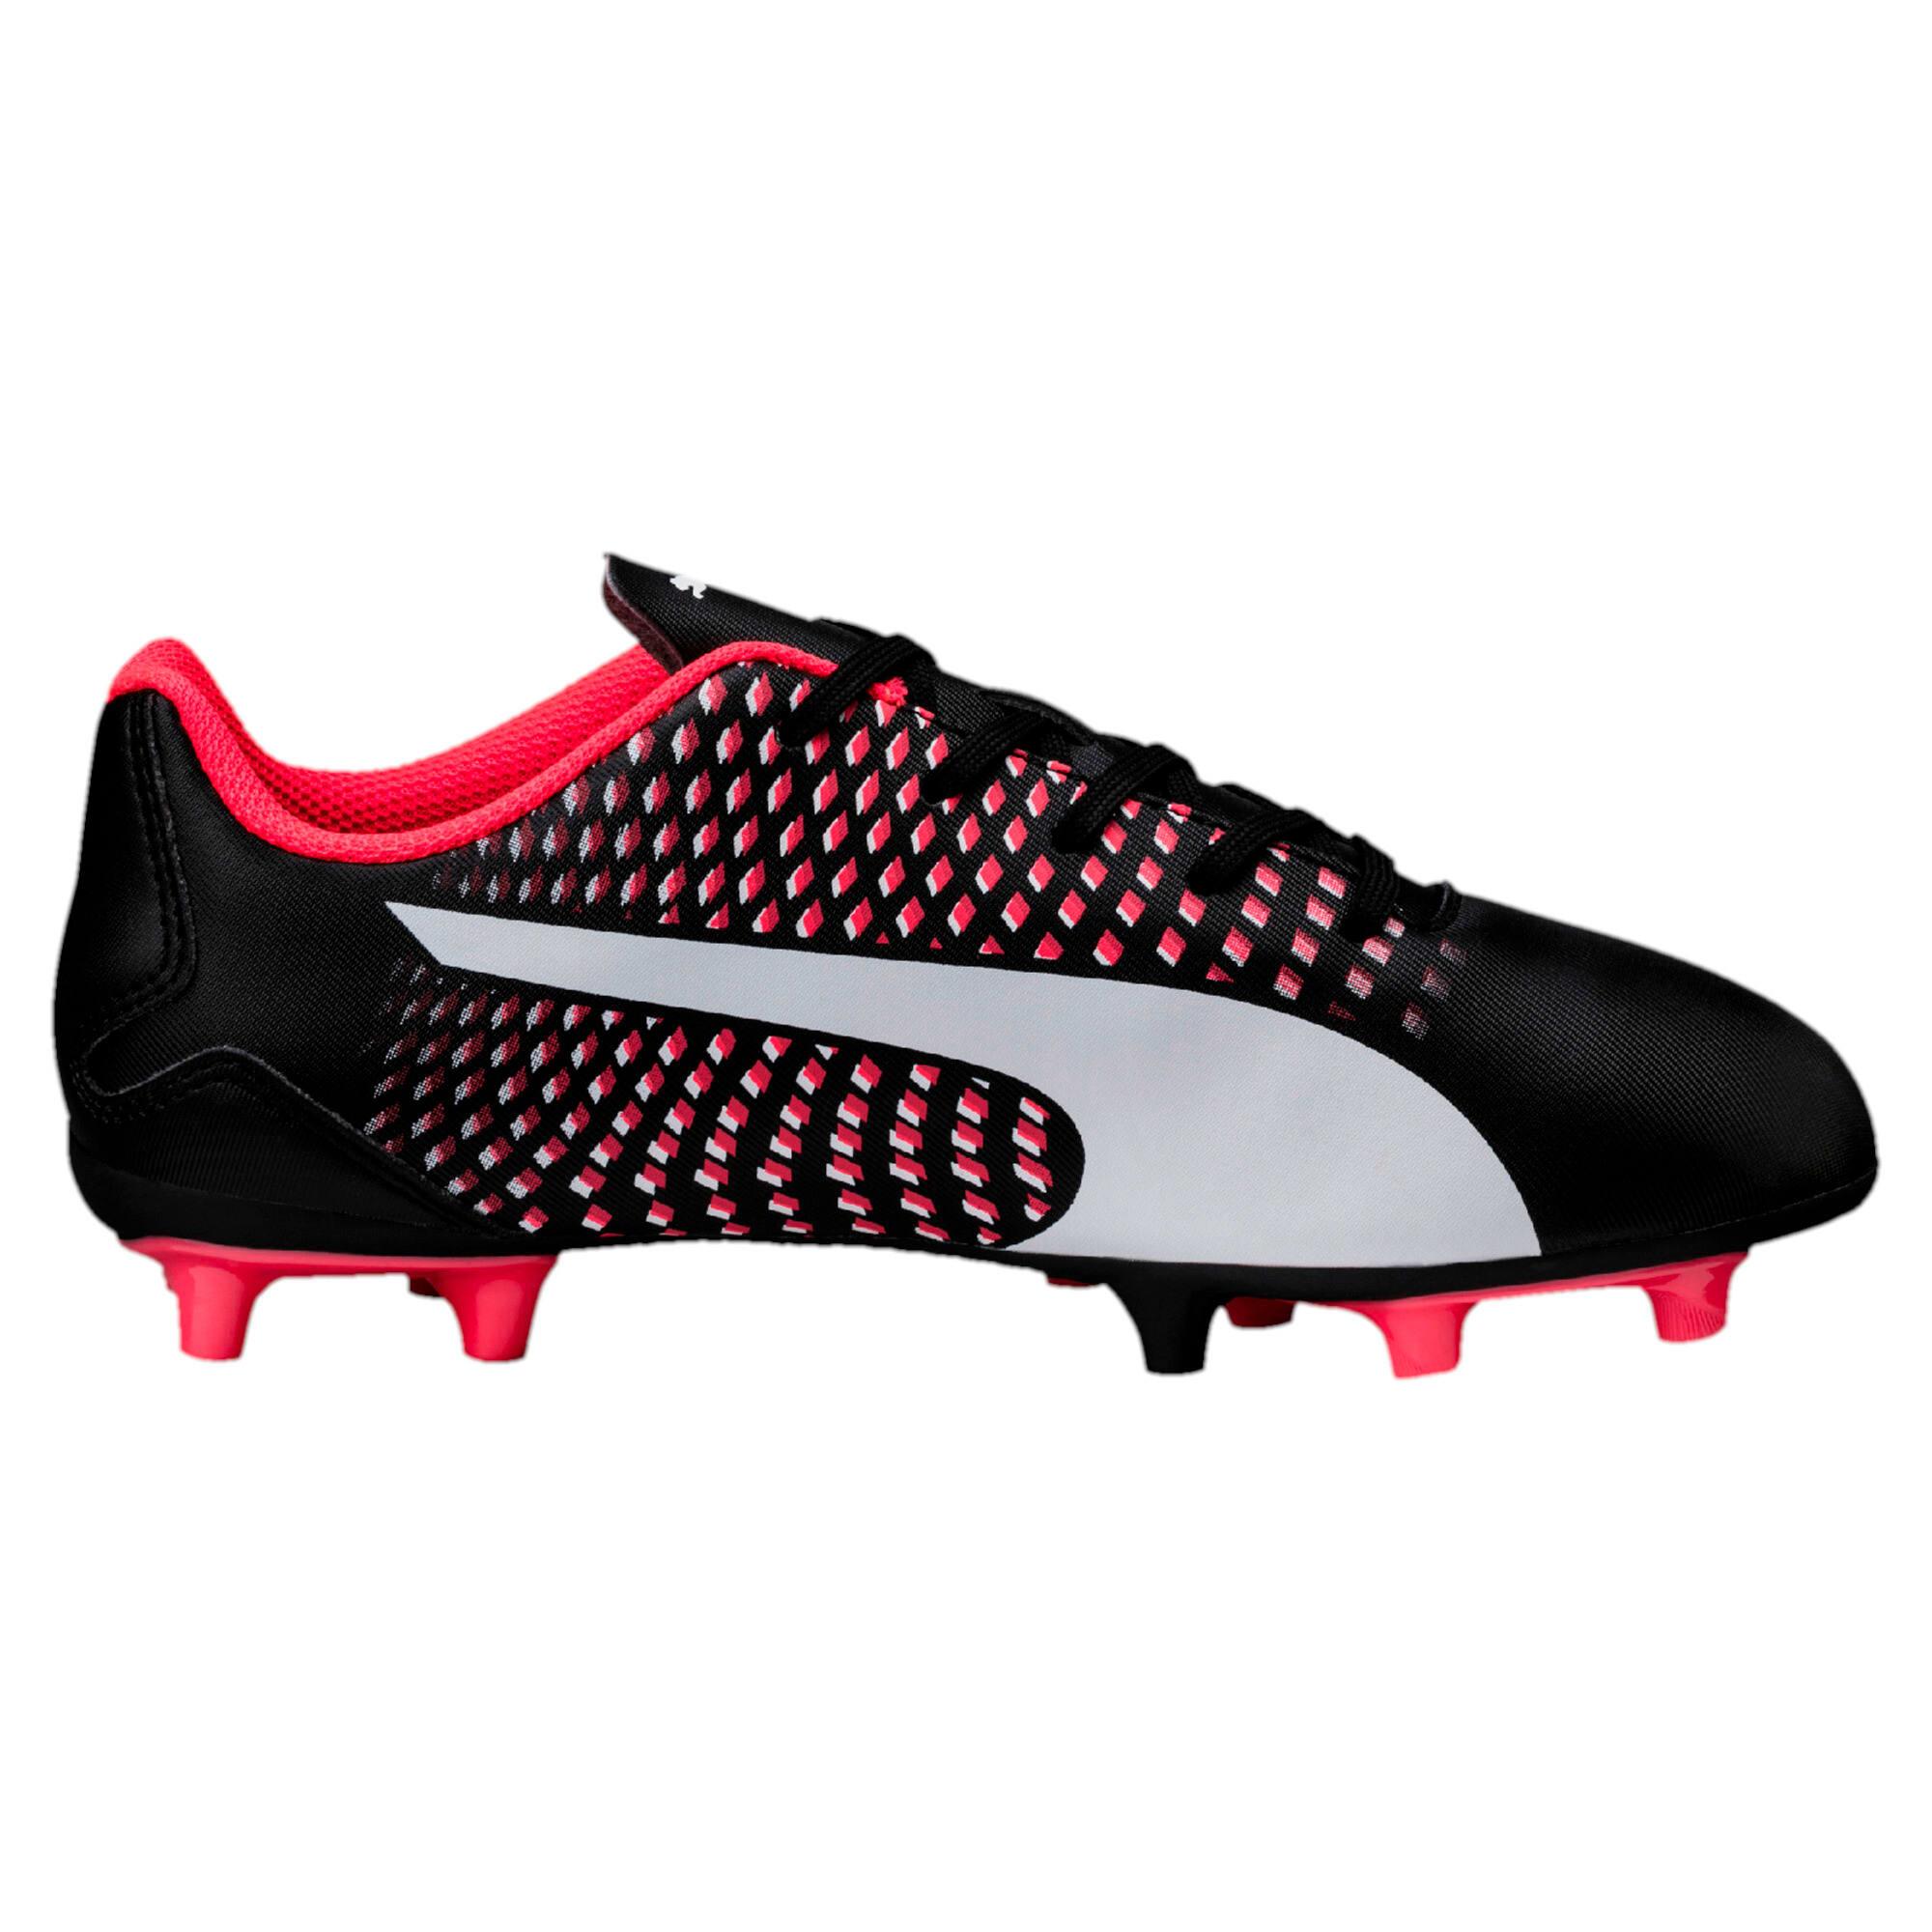 Thumbnail 5 of Adreno III FG Kids' Football Boots, black-white-plasma, medium-IND